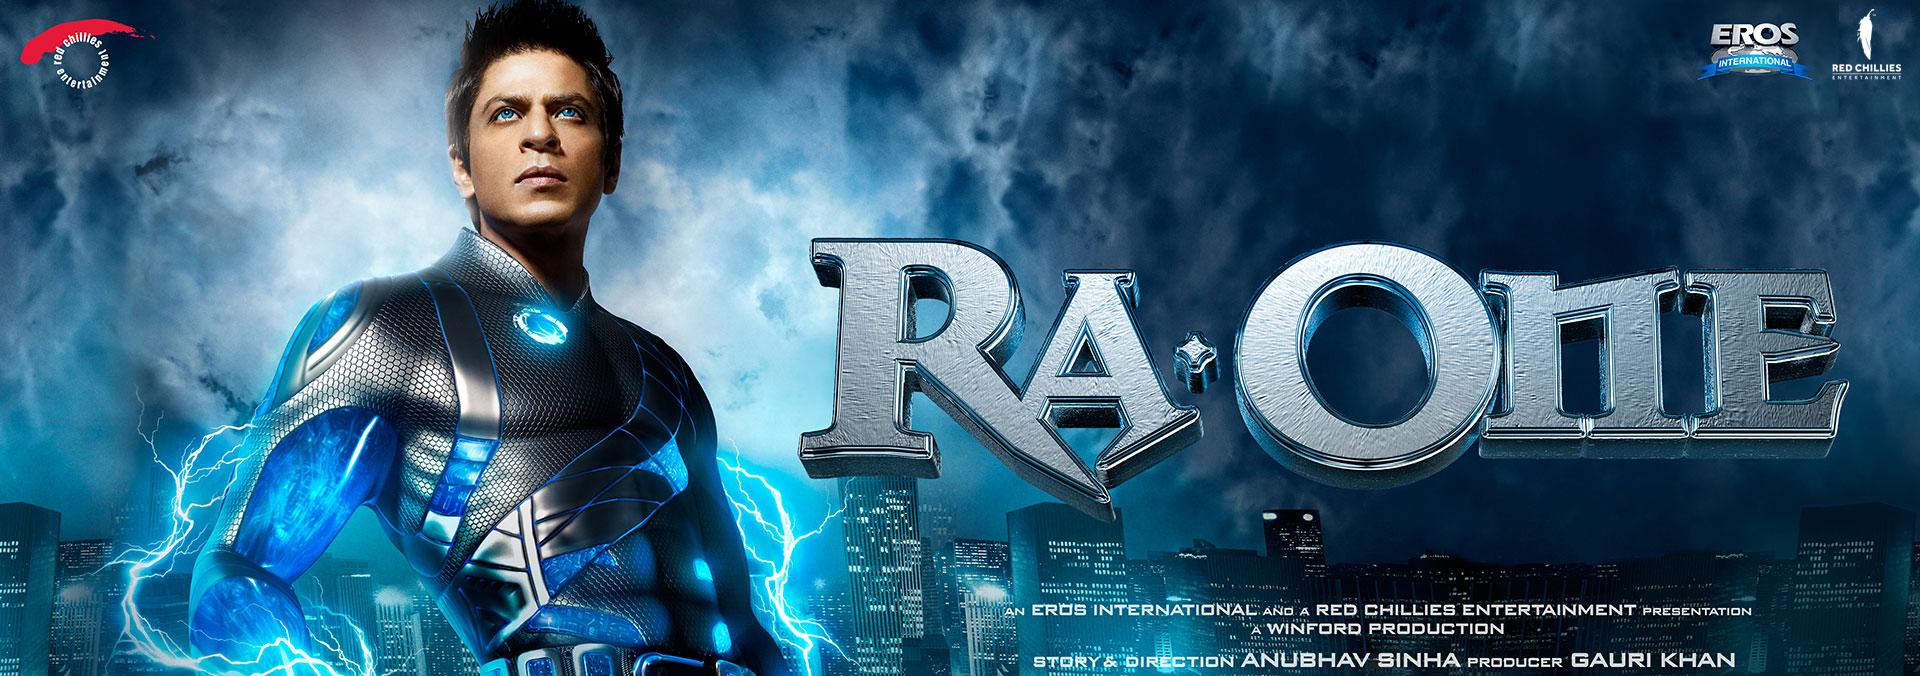 Ra one-1